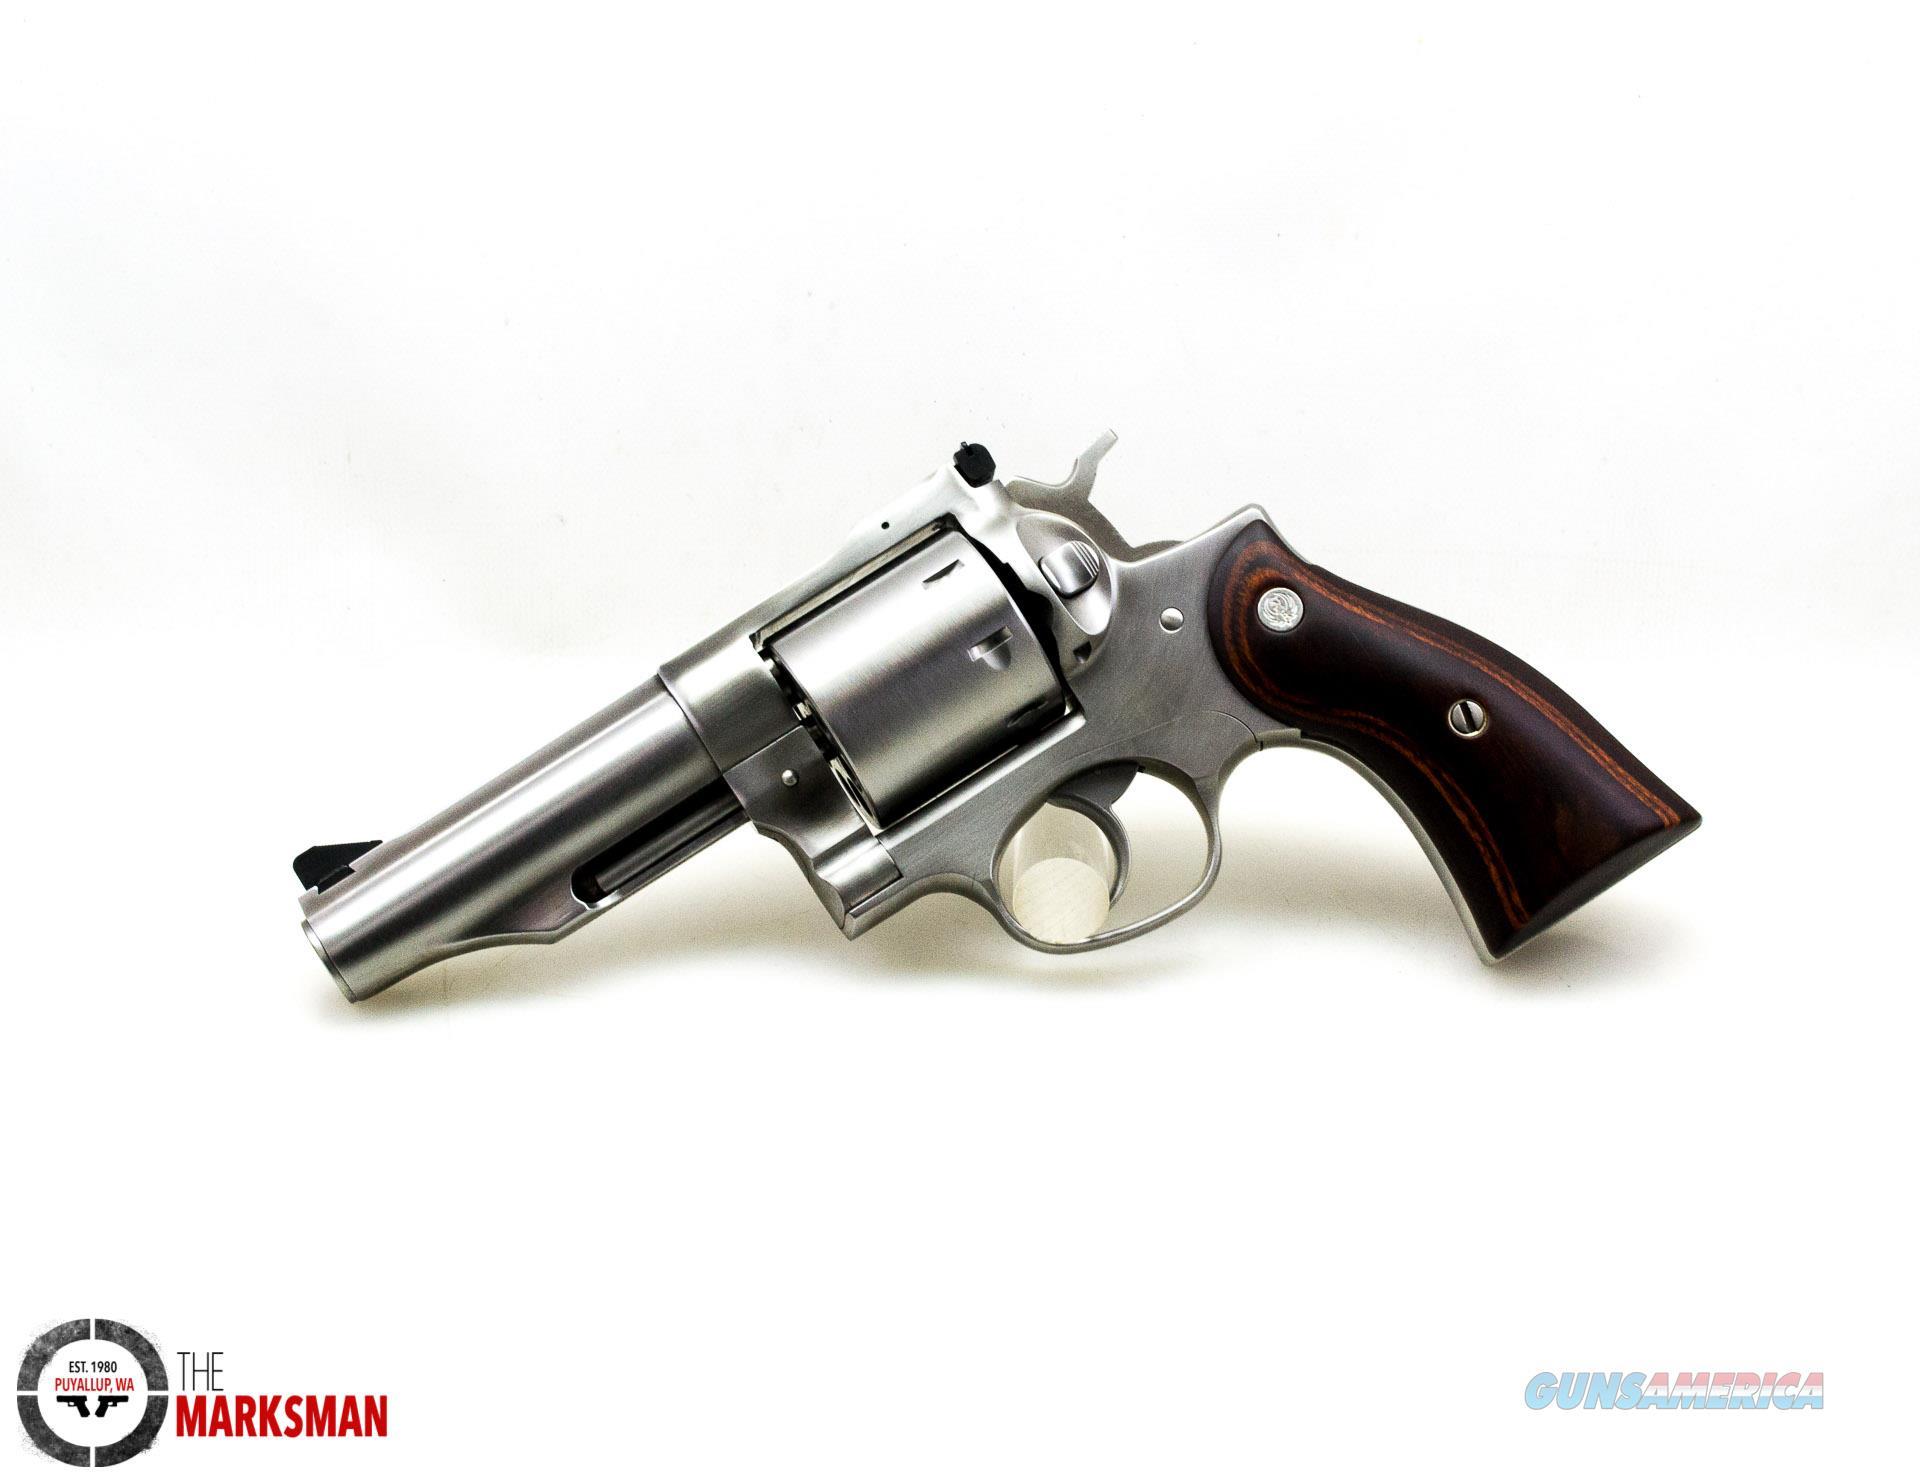 Ruger Redhawk, .357 Magnum NEW 05059 8 Round Cylinder  Guns > Pistols > Ruger Double Action Revolver > Redhawk Type